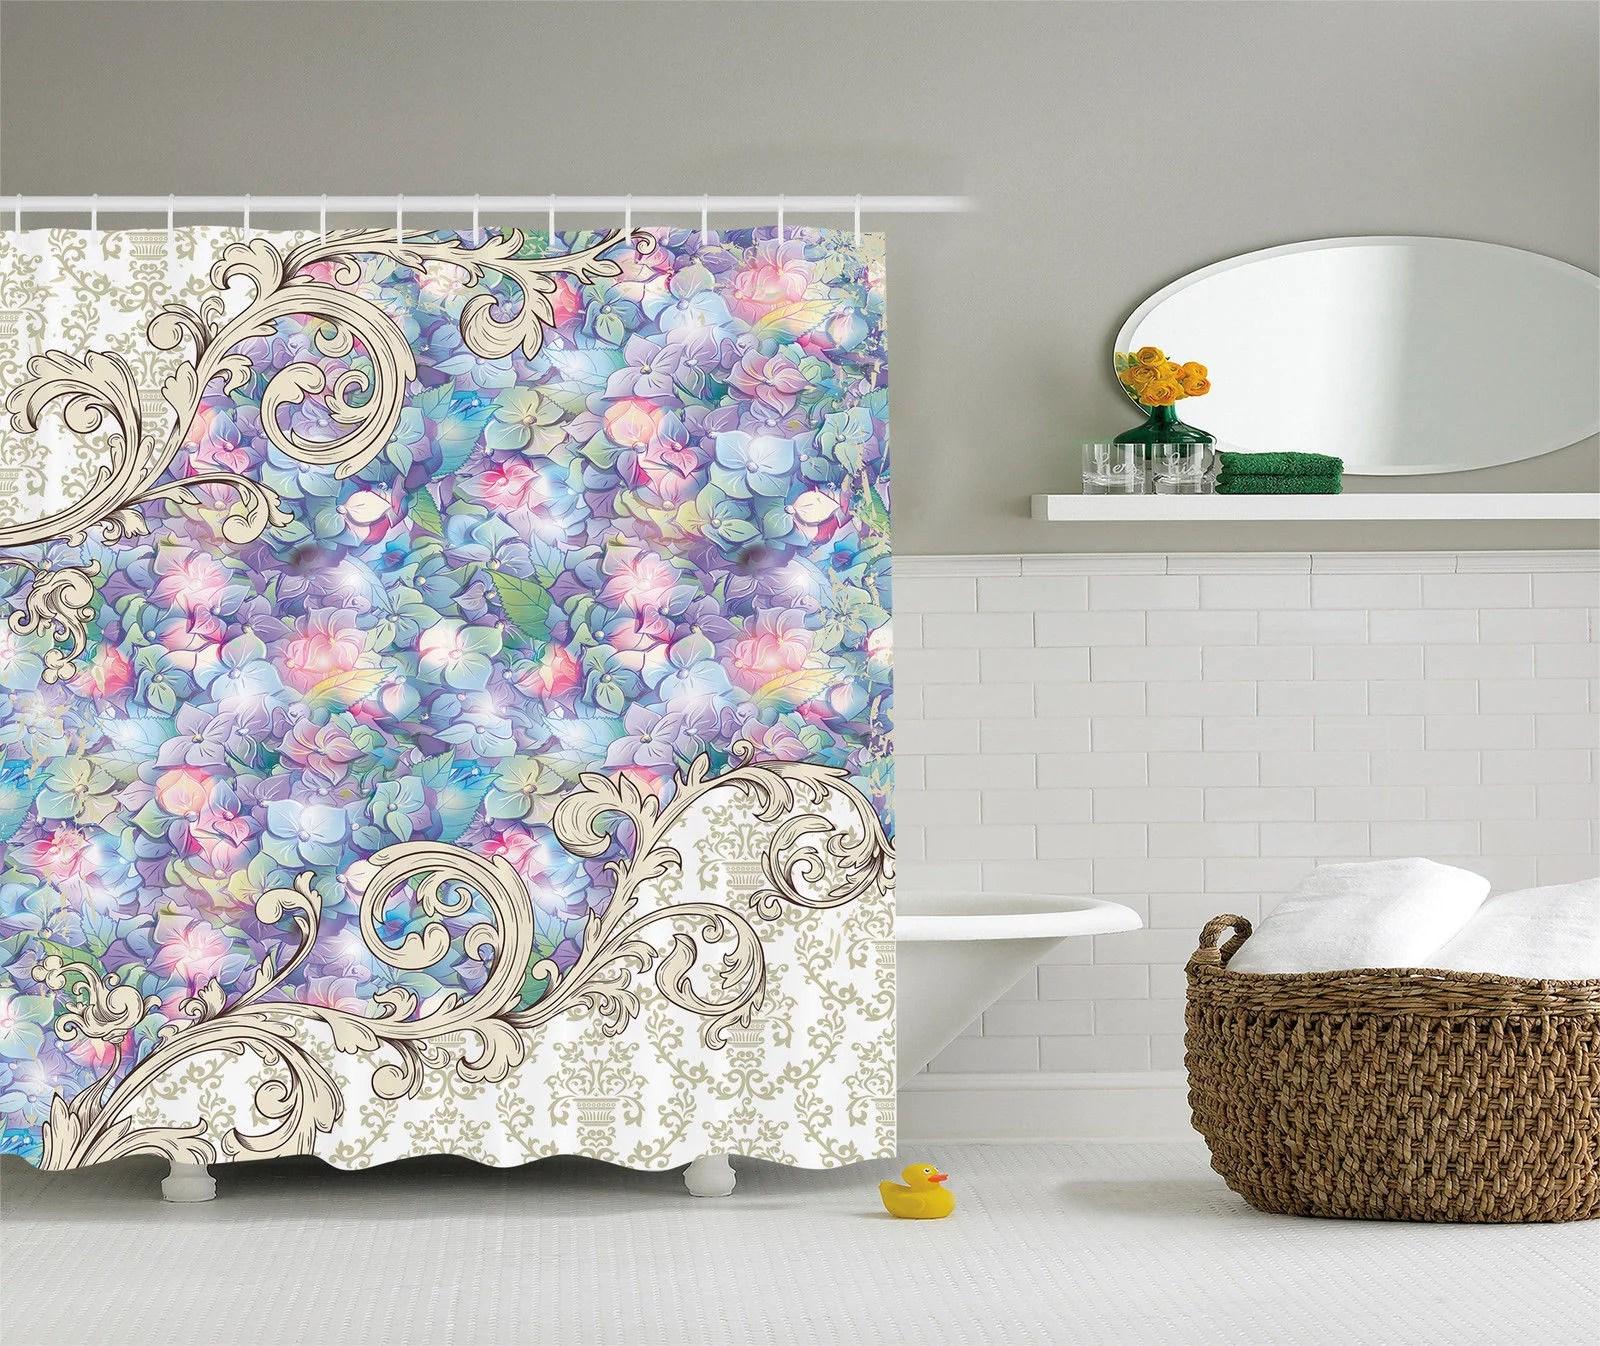 ornaments hydrangeas romantic flowers cream baroque lilac fabric shower curtain